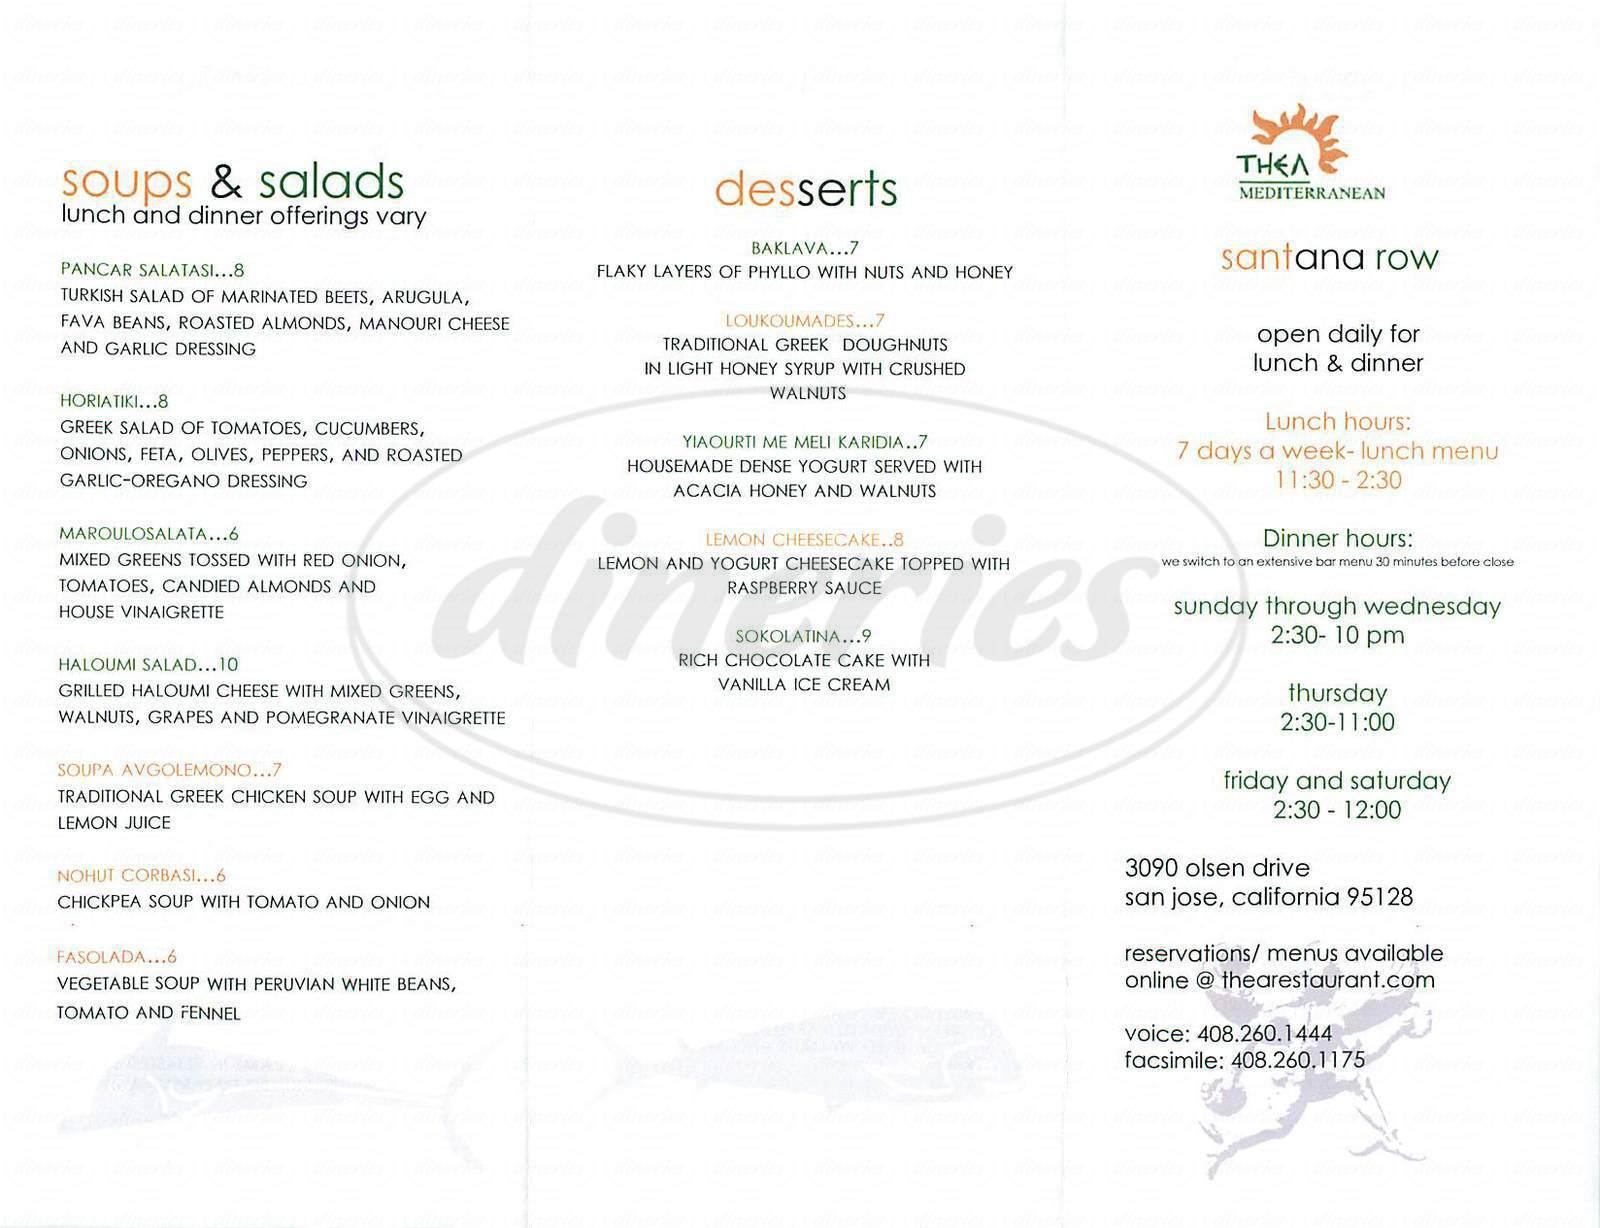 menu for Thea Mediterranean